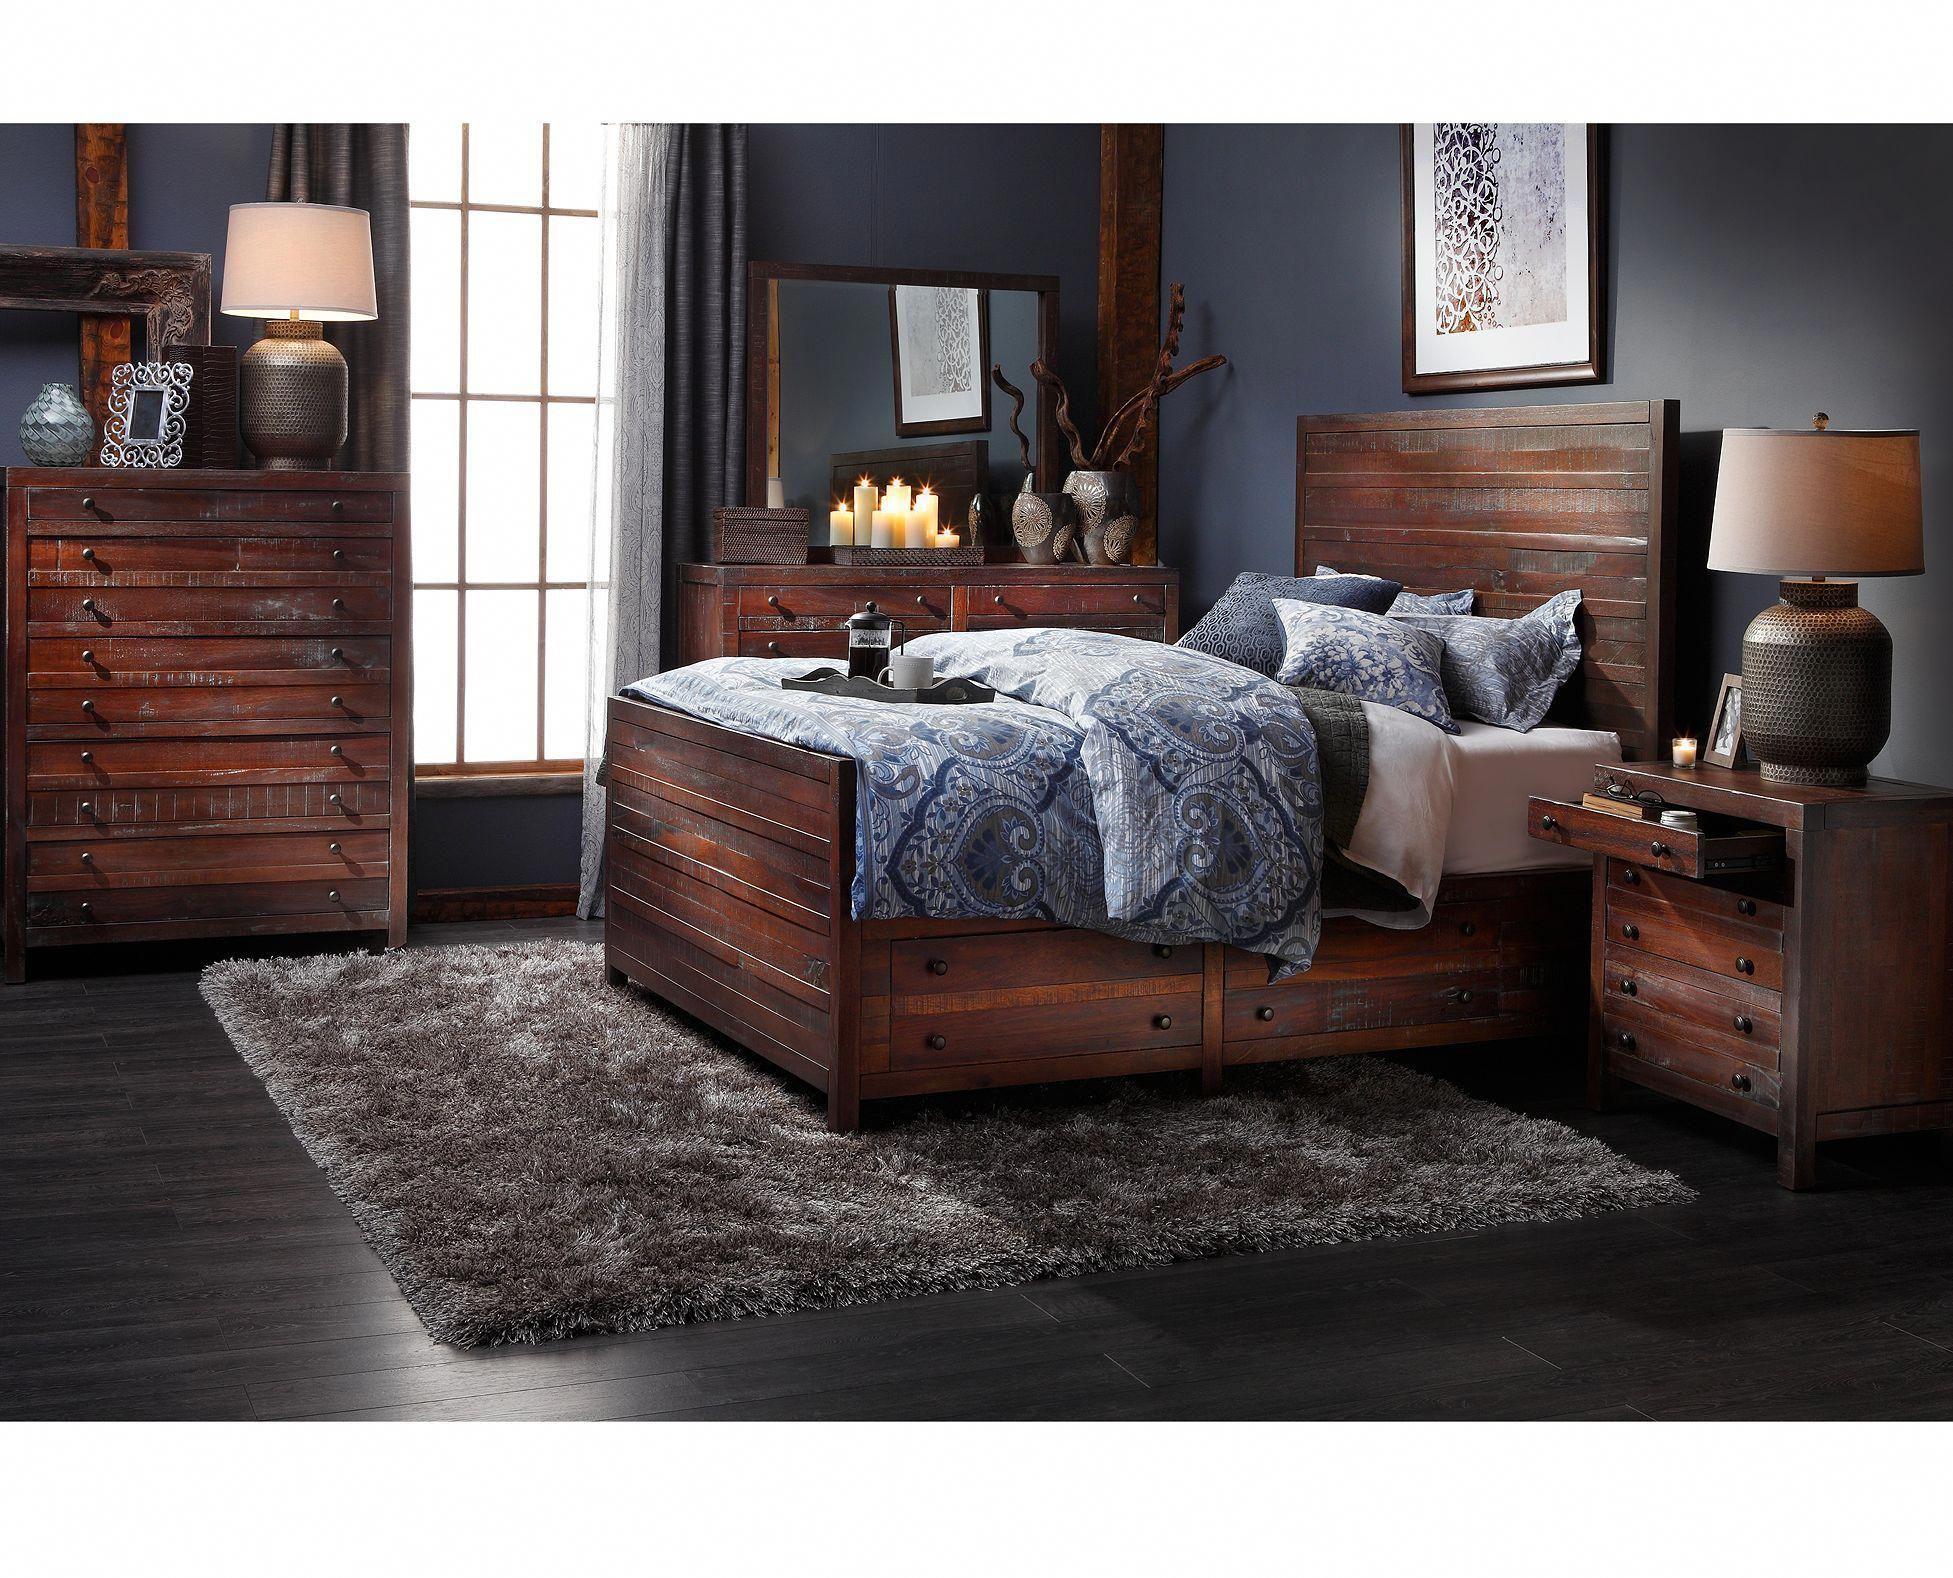 Jaipur Storage Bedroom Set - Furniture Row - $12